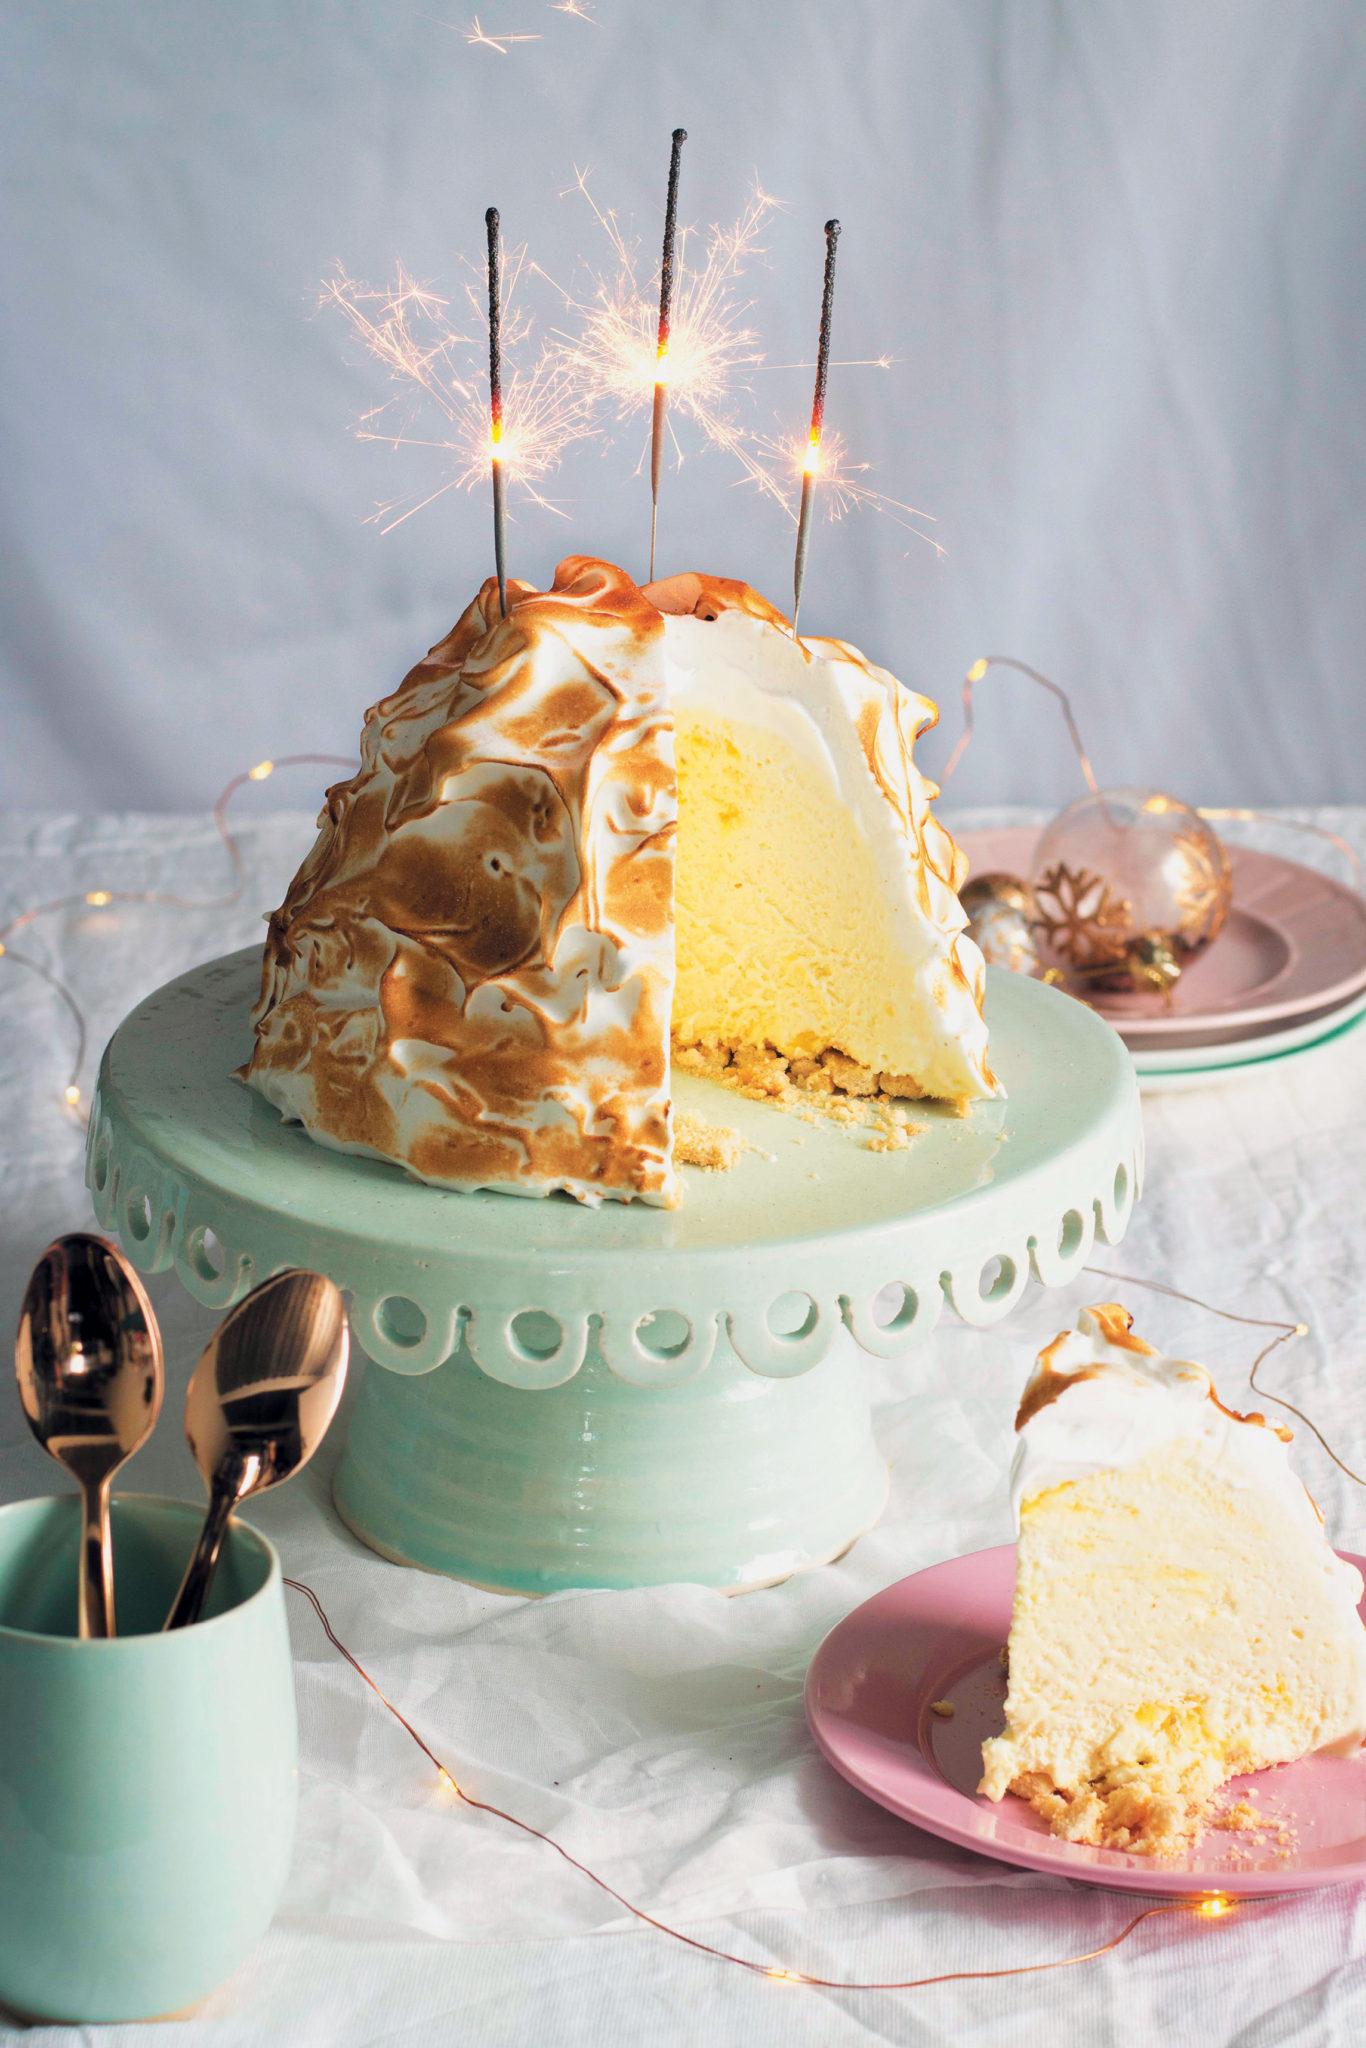 Cake Ice Cream Meringue : Coconut lemon meringue ice cream cake Food & Home ...